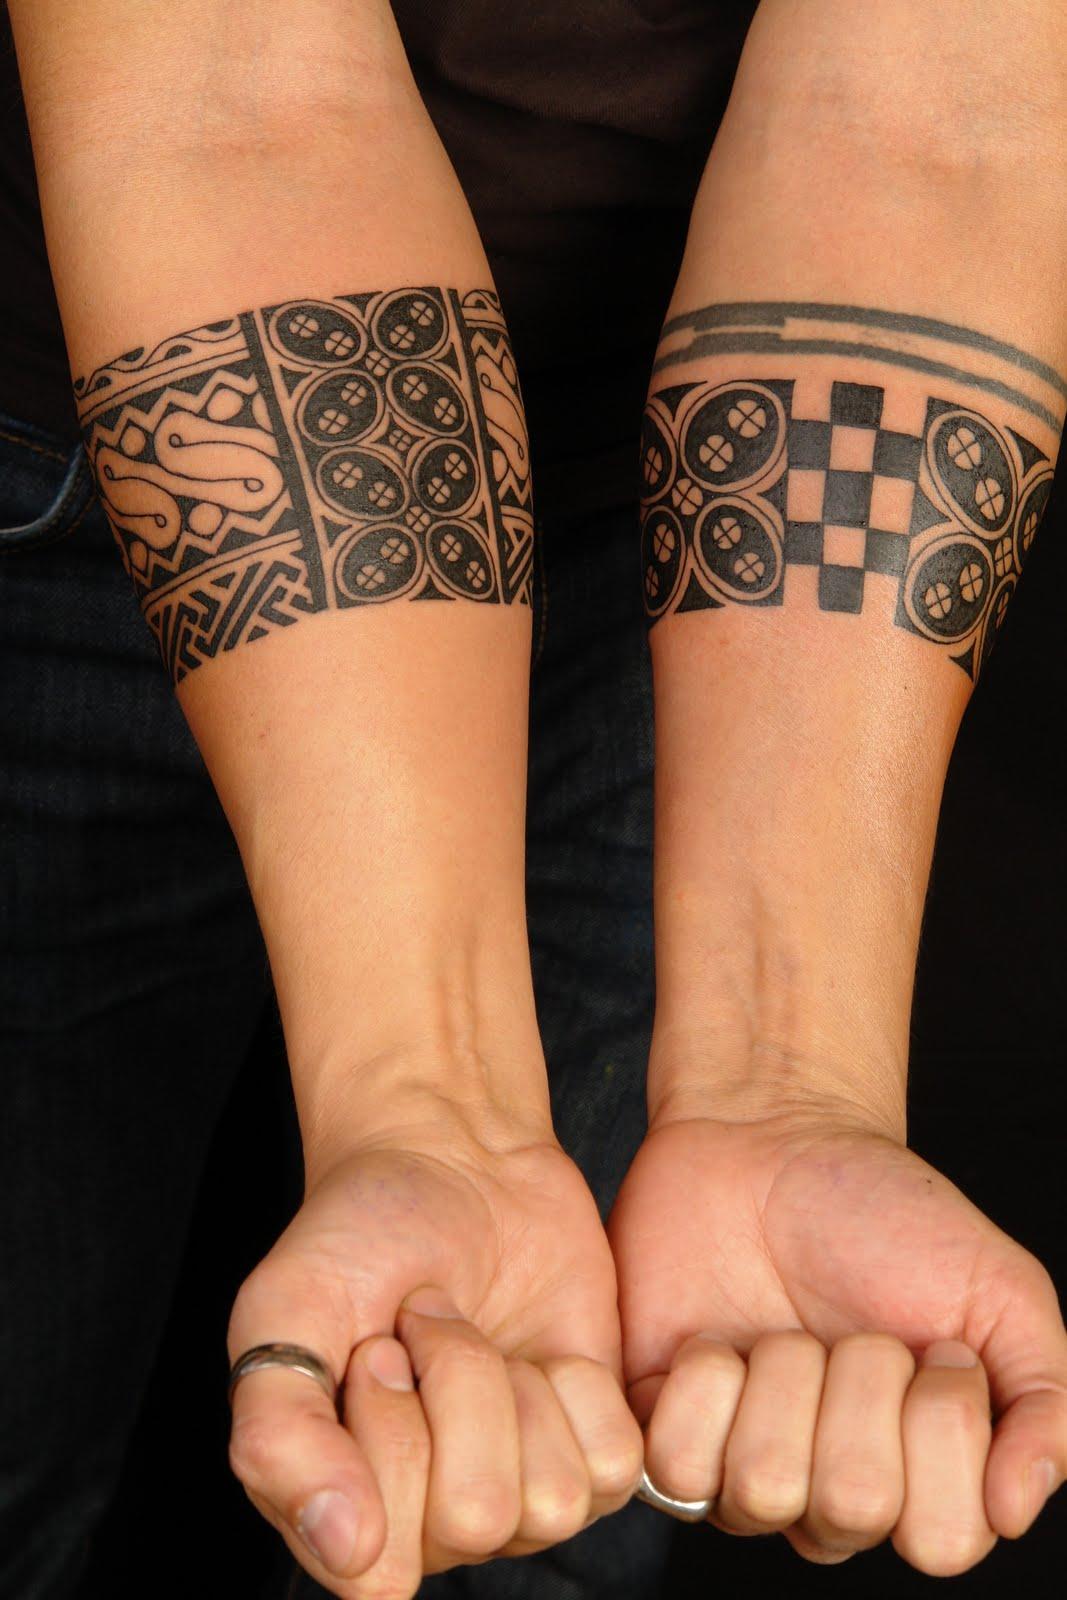 bali crazy tattoo design. Black Bedroom Furniture Sets. Home Design Ideas